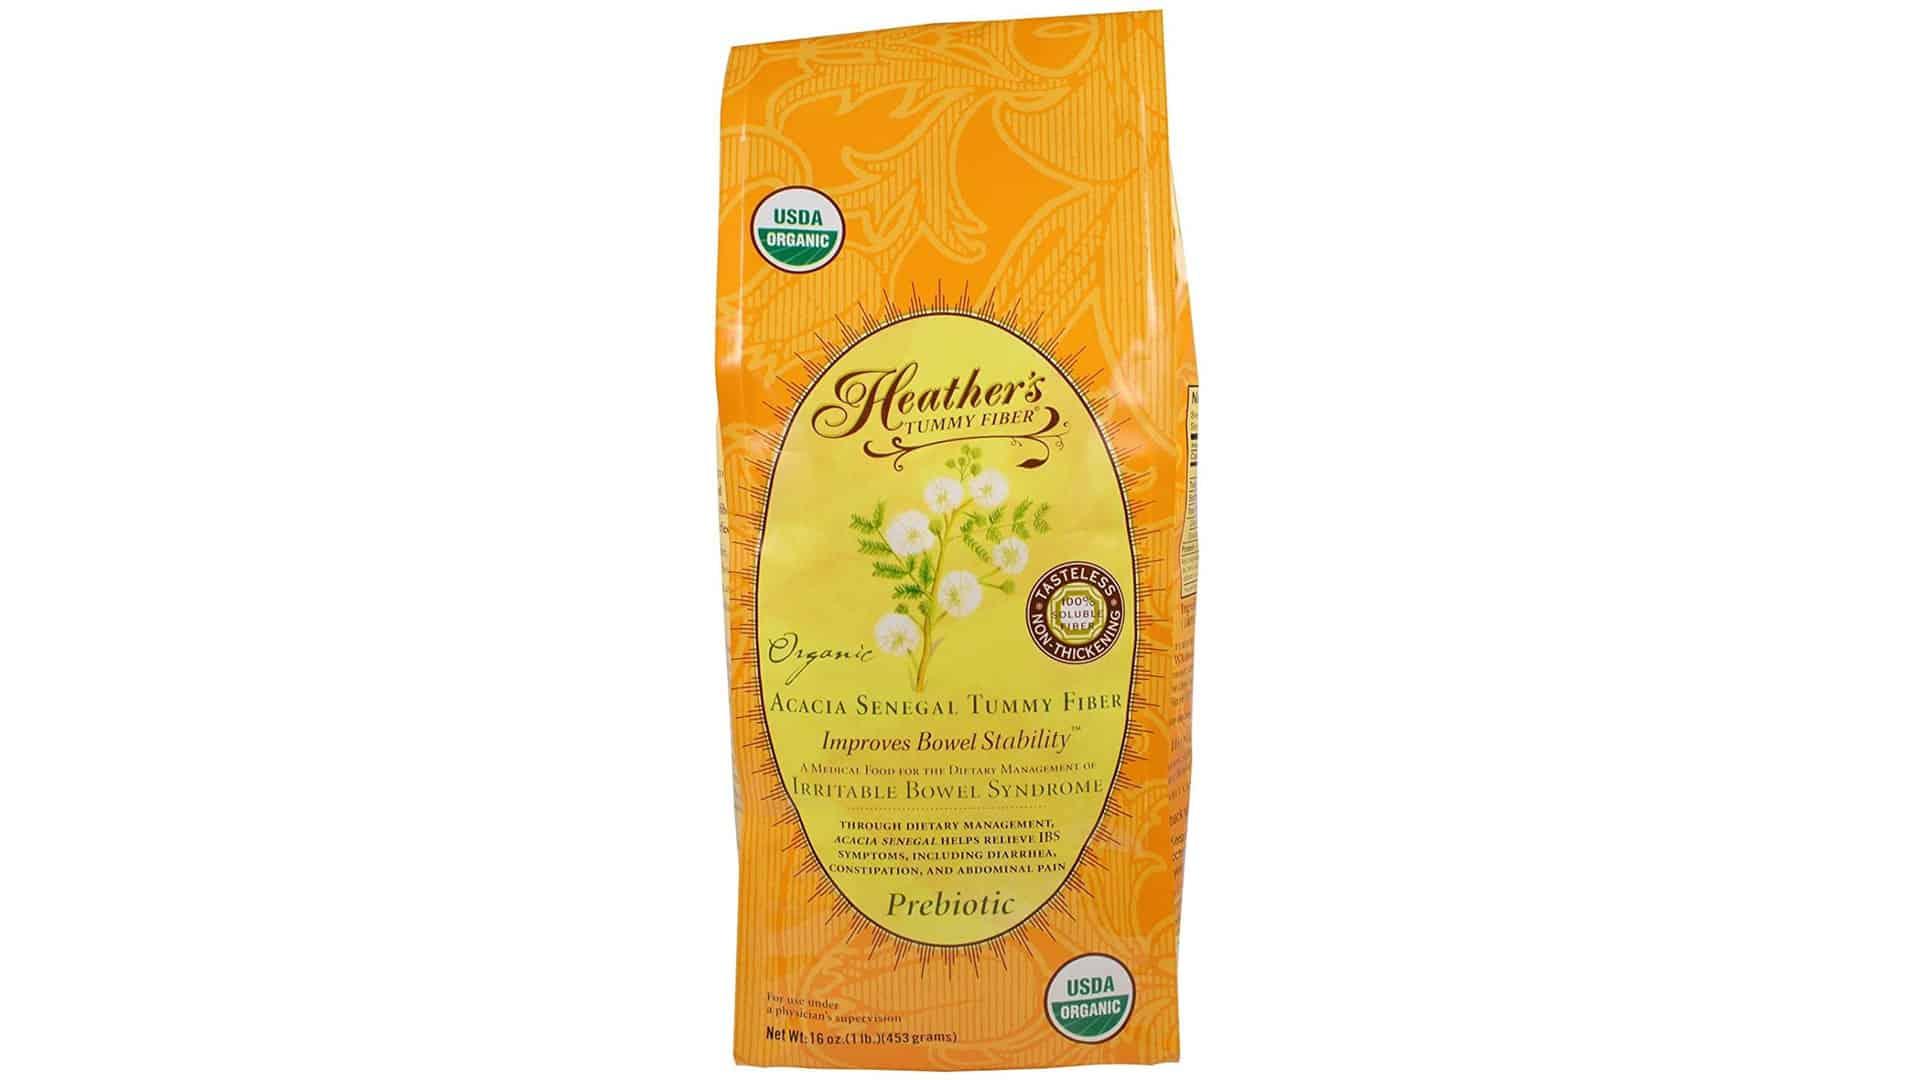 Heathers Tummy fiber POUCH Organic Acacia Senegal